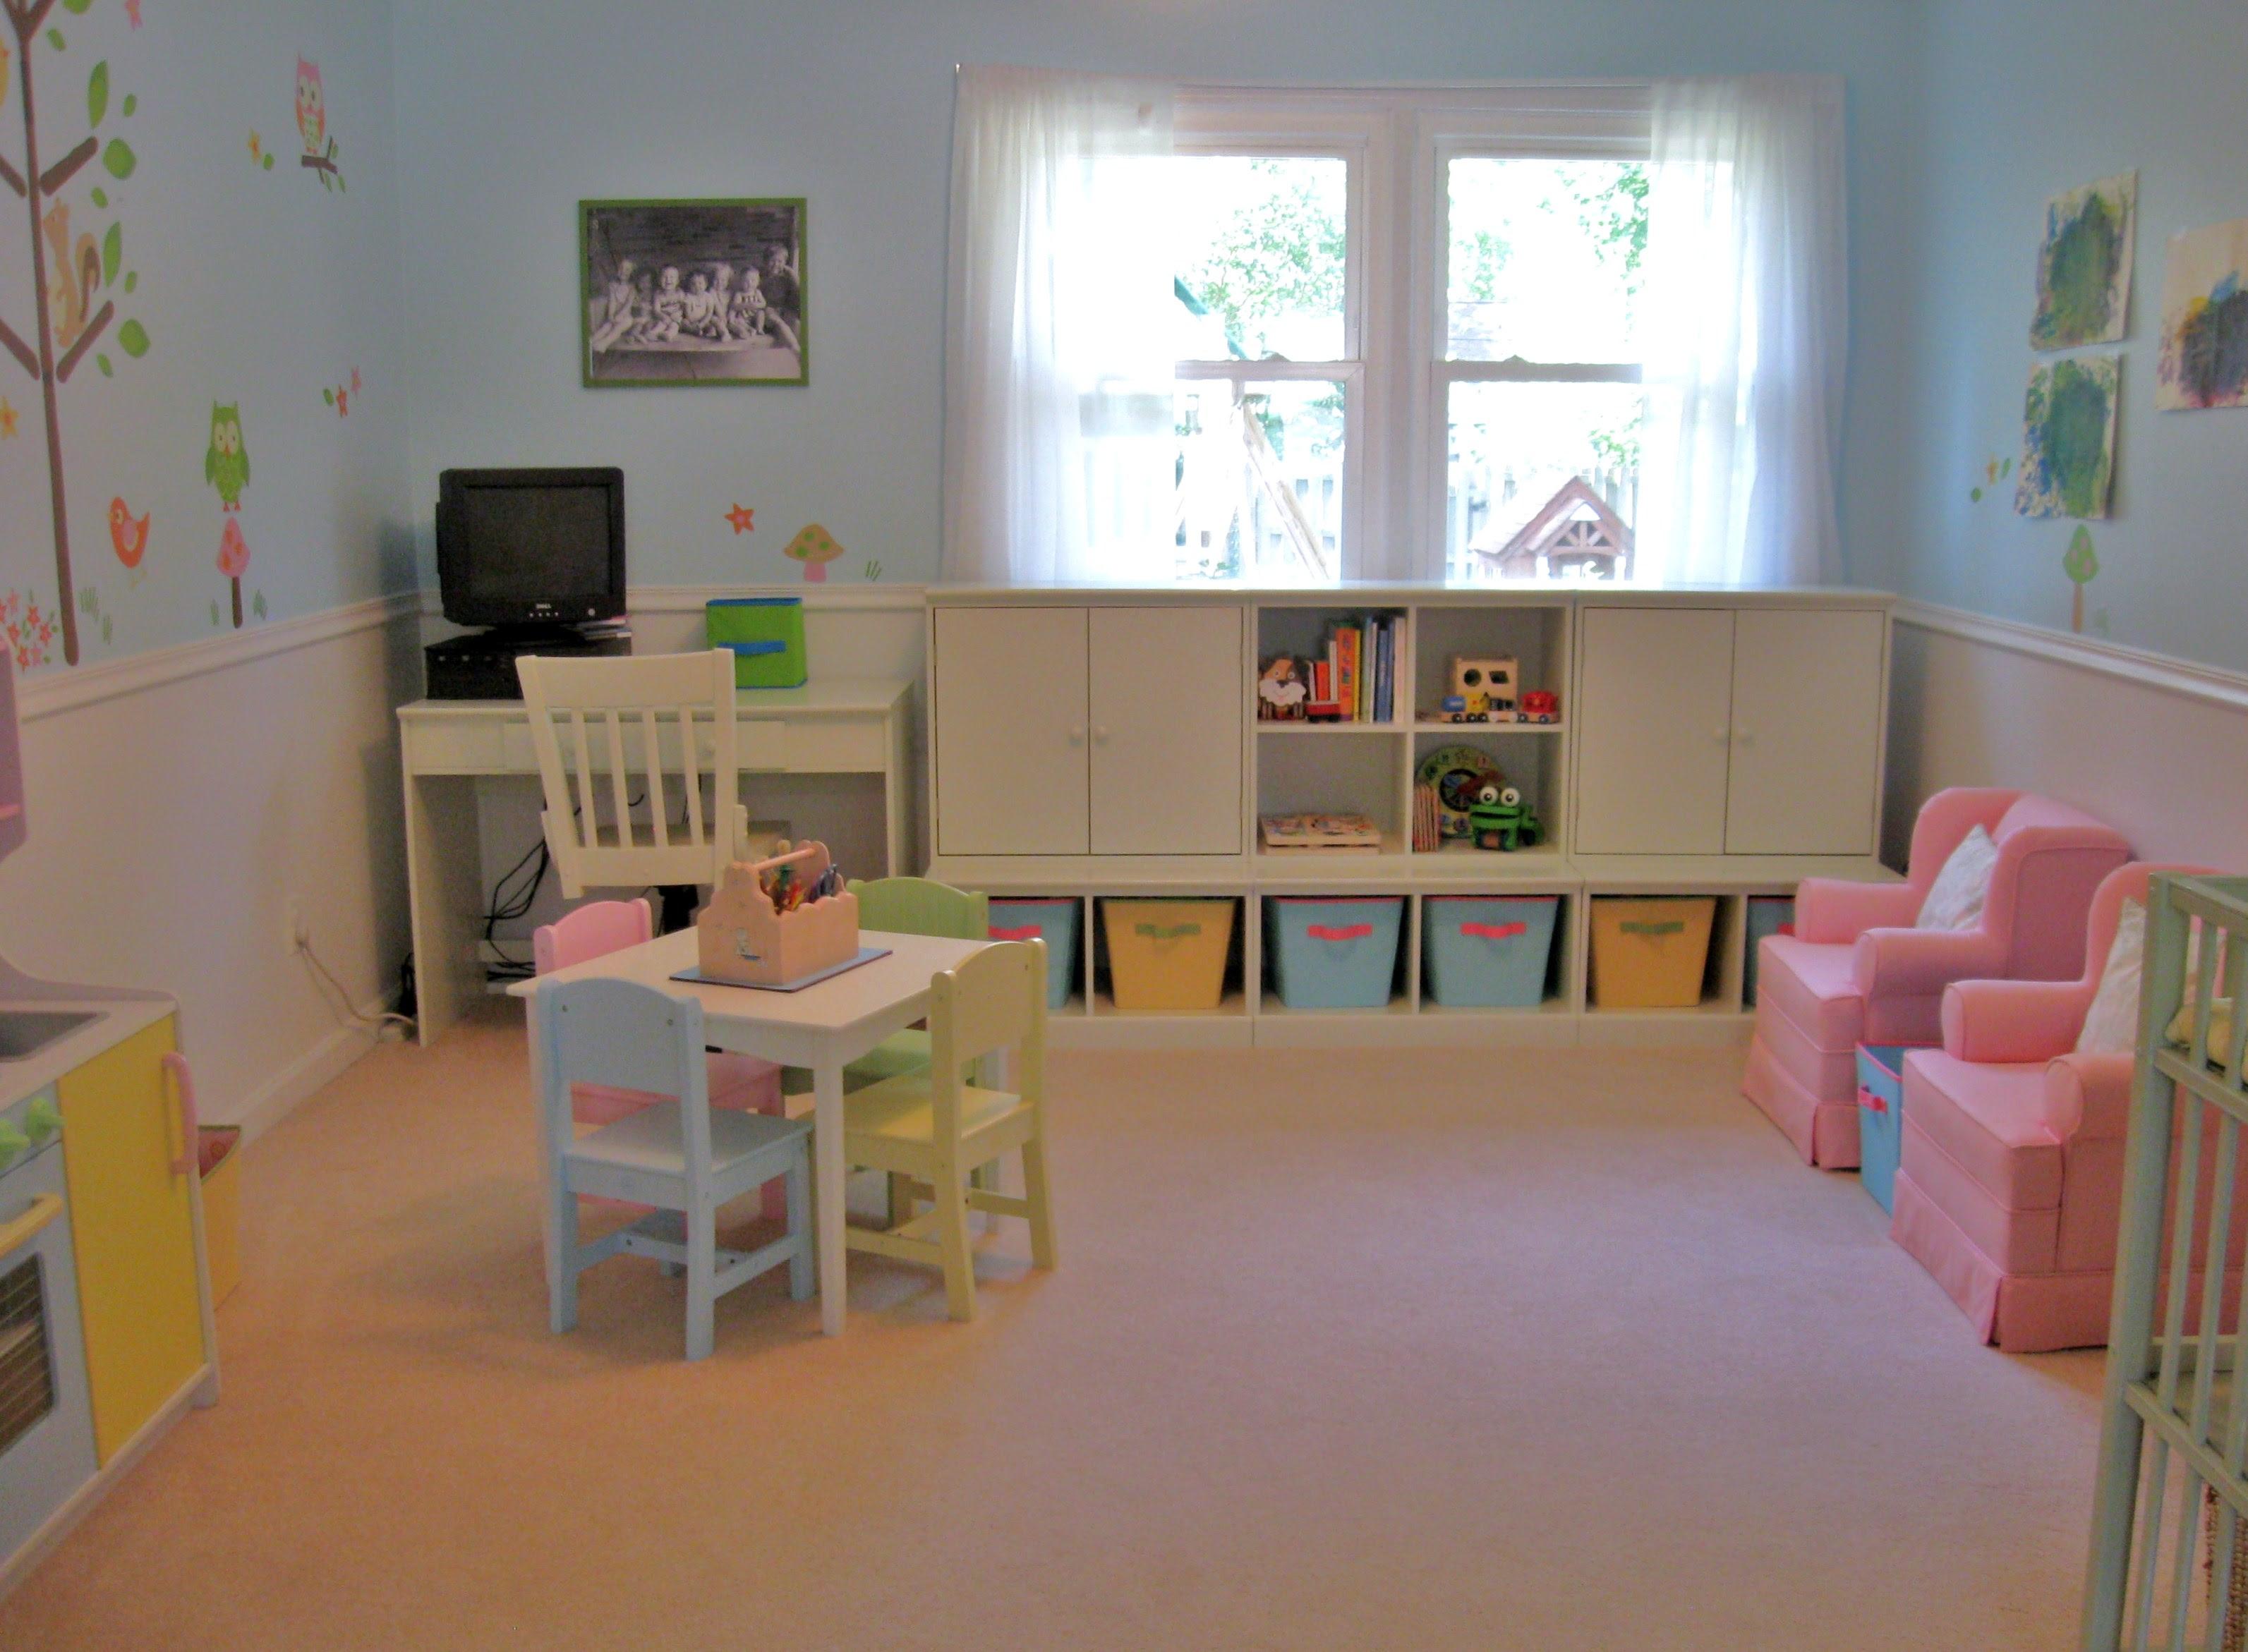 Designing the perfect playroom - takingtimeformommy.